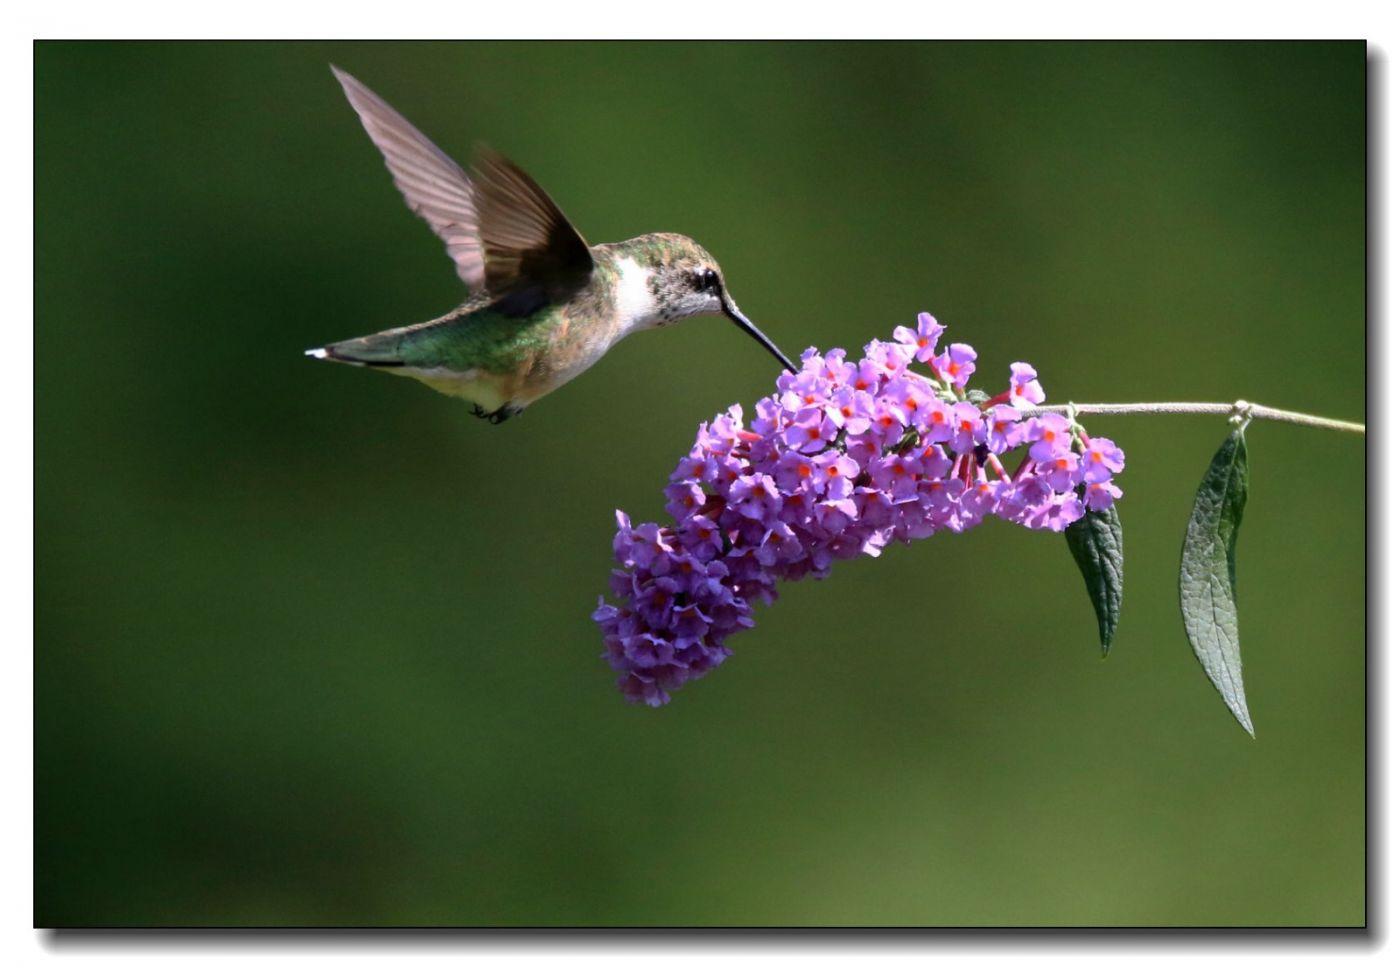 蜂鸟组图(五)_图1-10